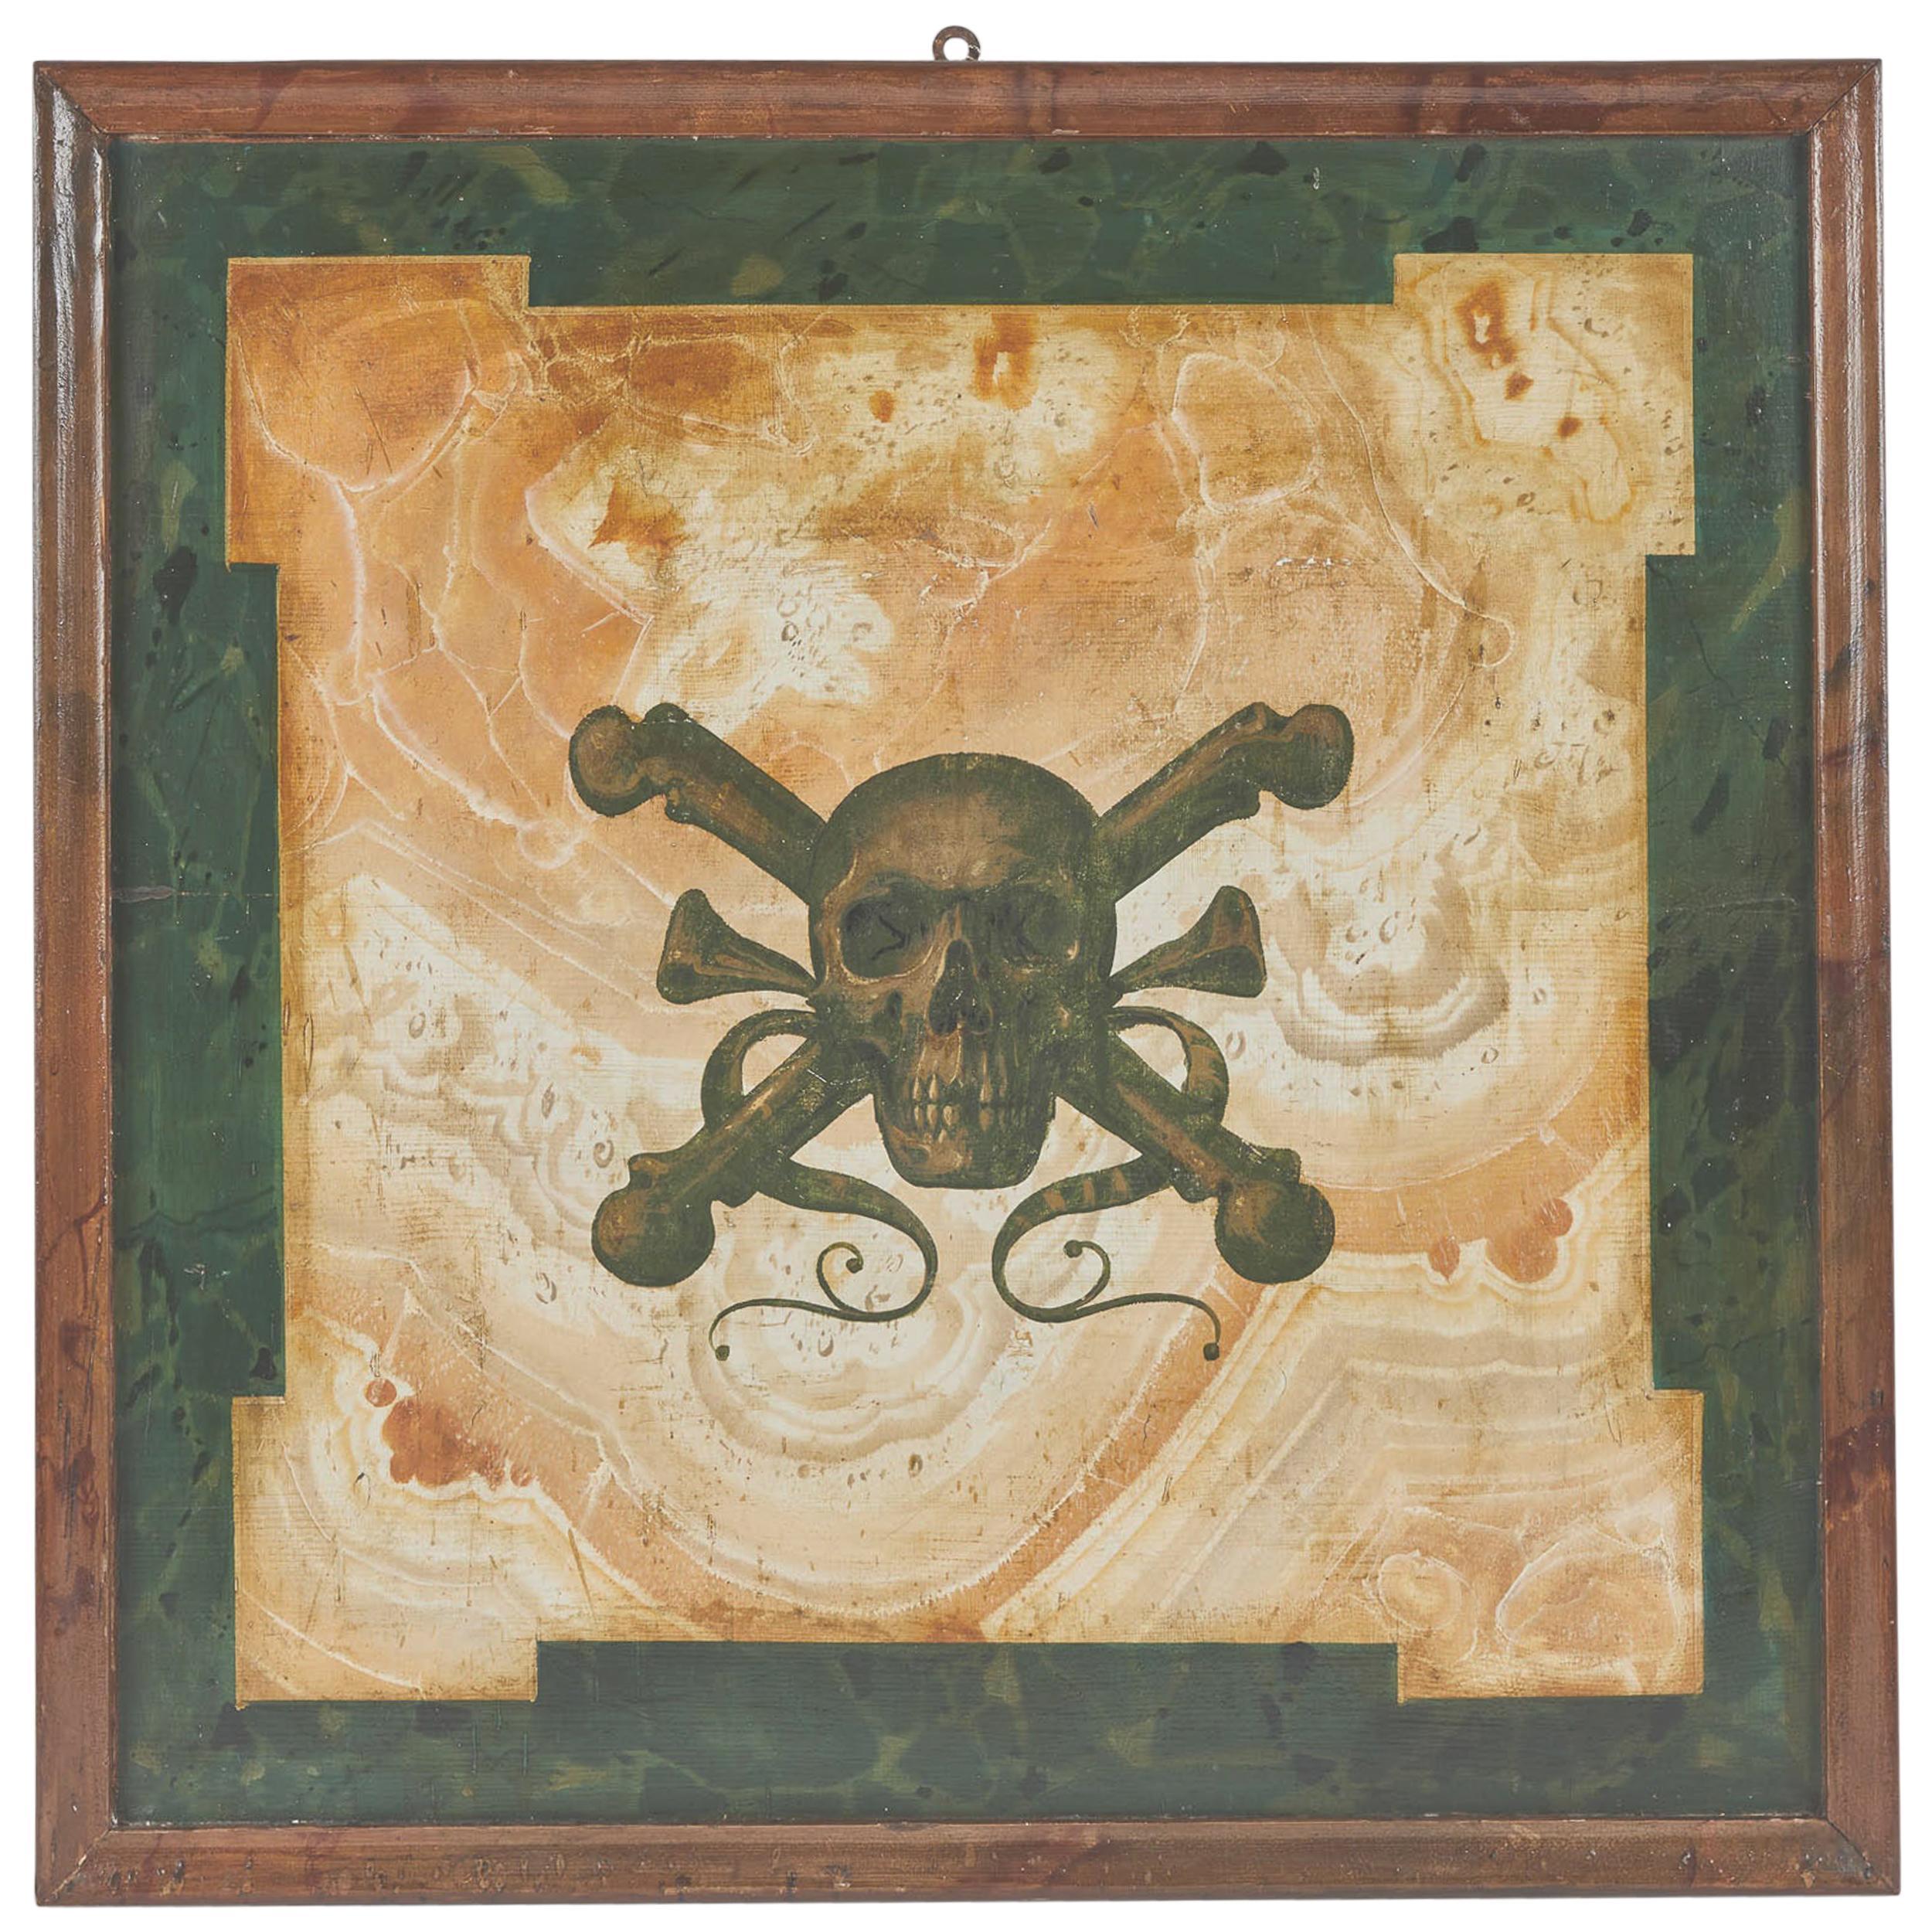 Mid-19th Century Italian Funerary Sign with Stylized Skull